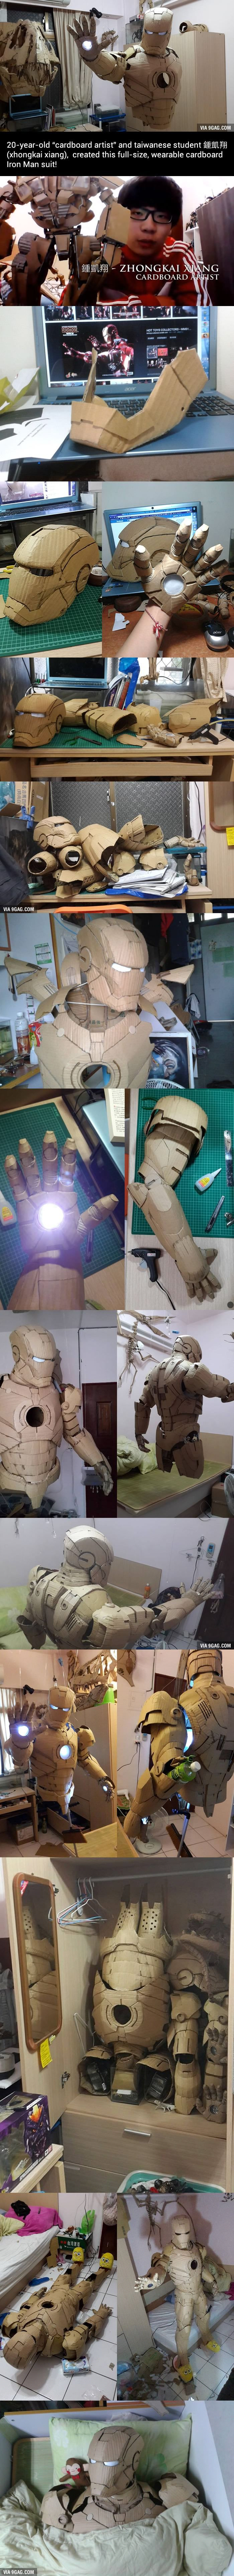 "Iron Man in Cardboard by the Taiwanese ""Cardboard Artist"""